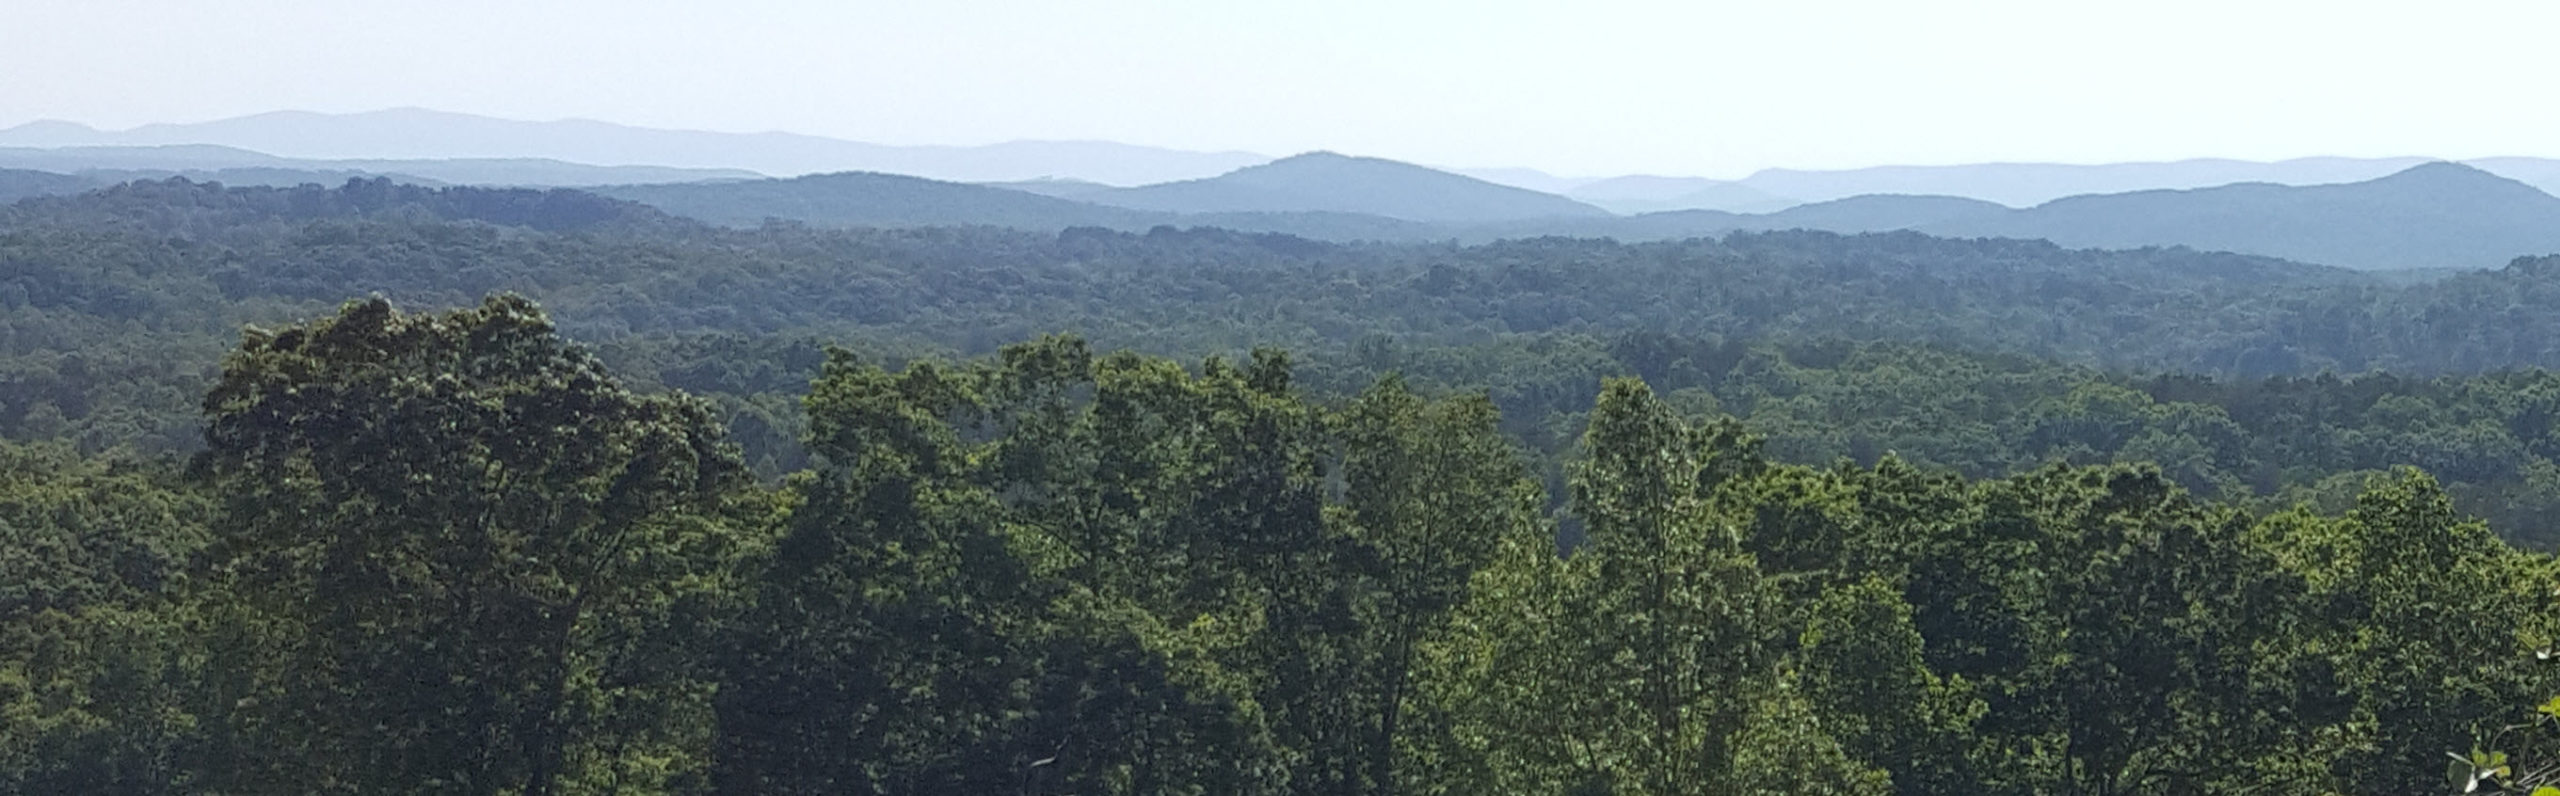 Wolf-Mountain-Vineyards-Blue-Ridge-Mountains-View-2016-05